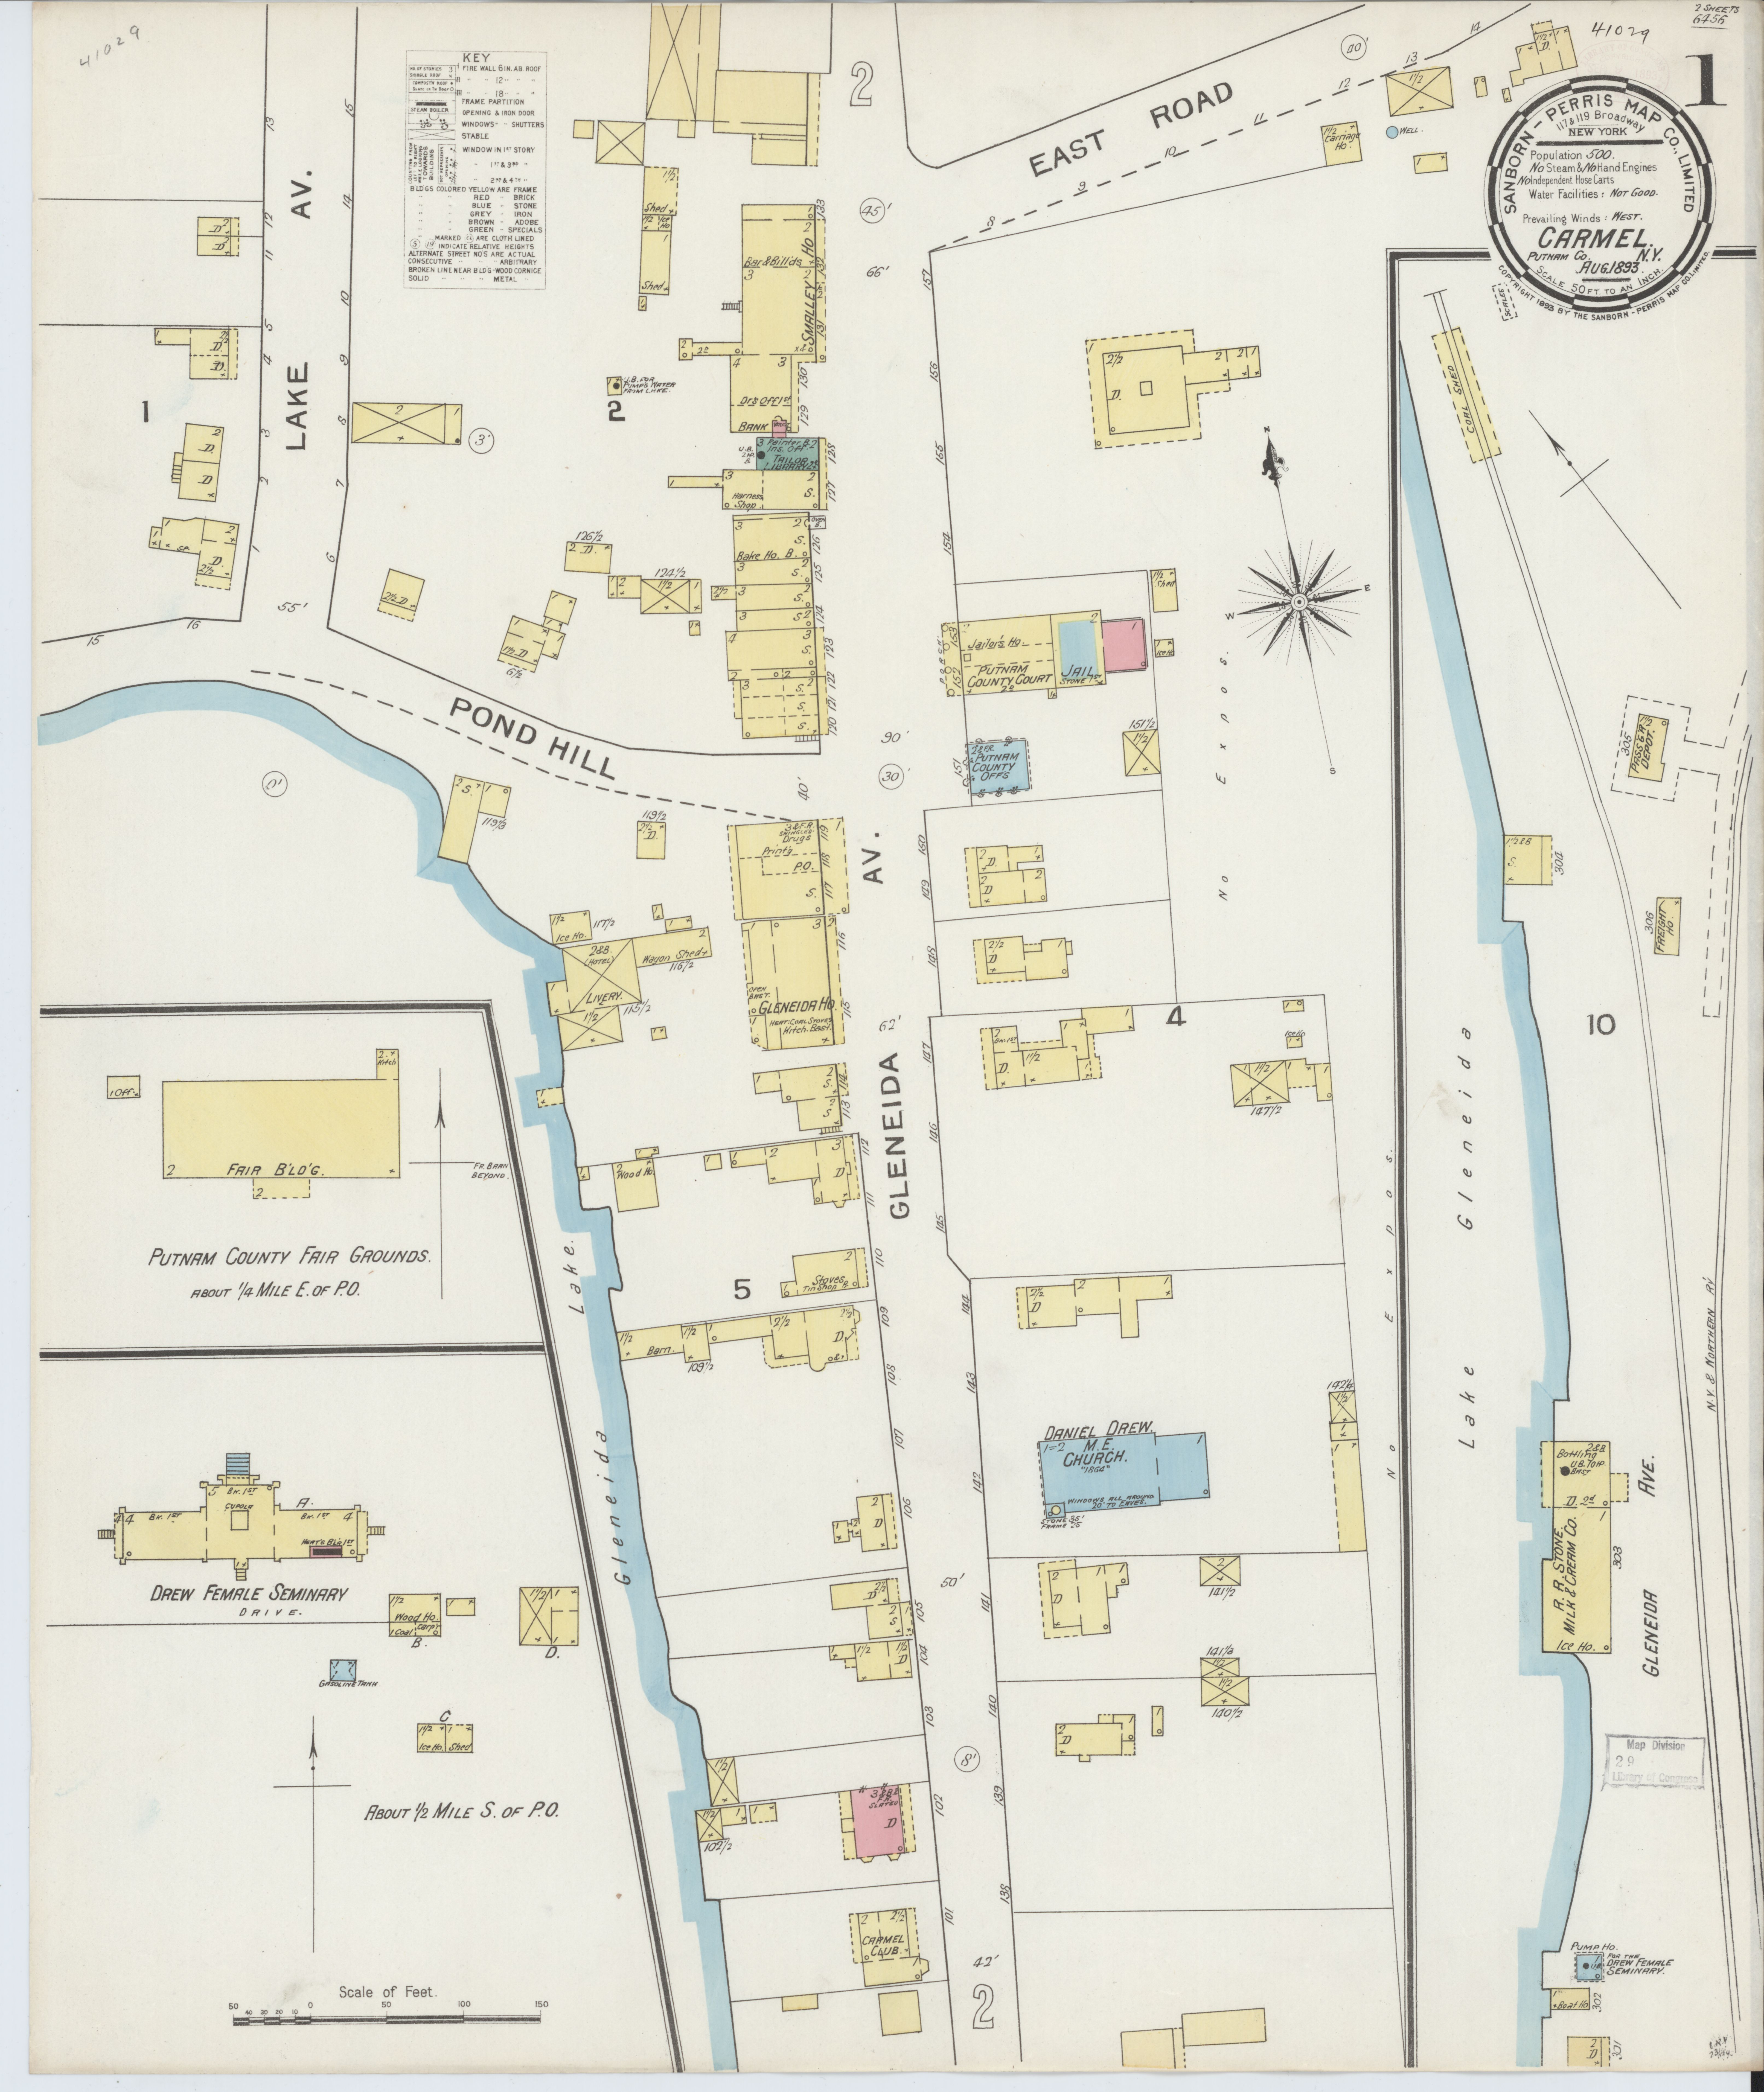 File:Sanborn Fire Insurance Map from Carmel, Putnam County, New York on